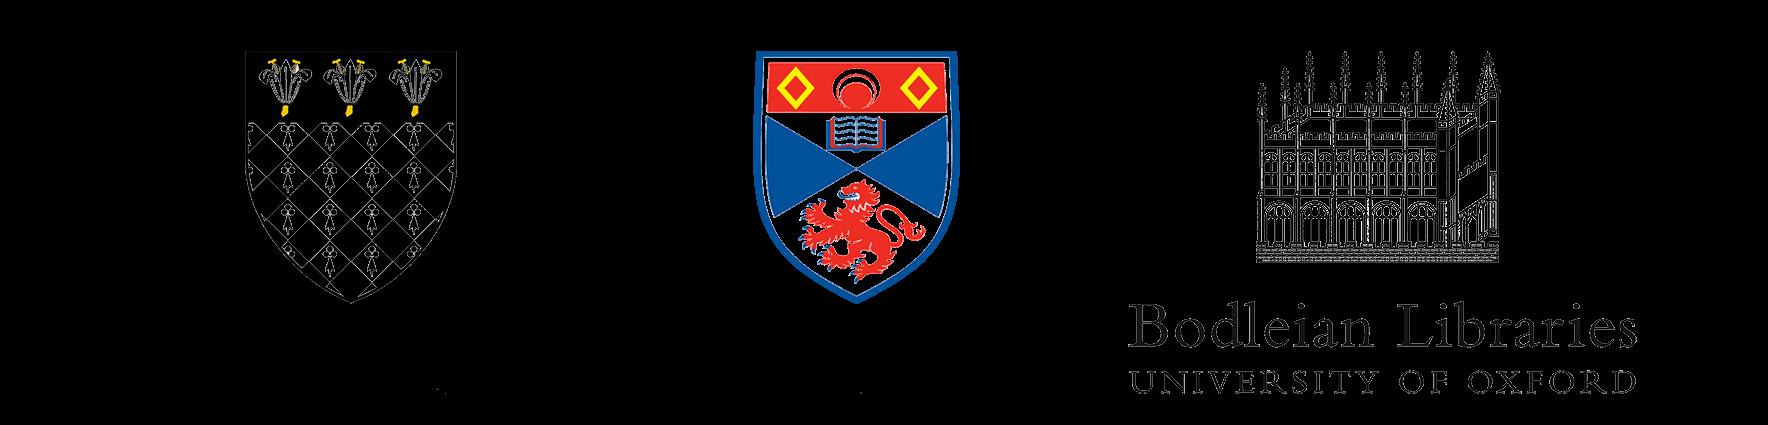 logos row